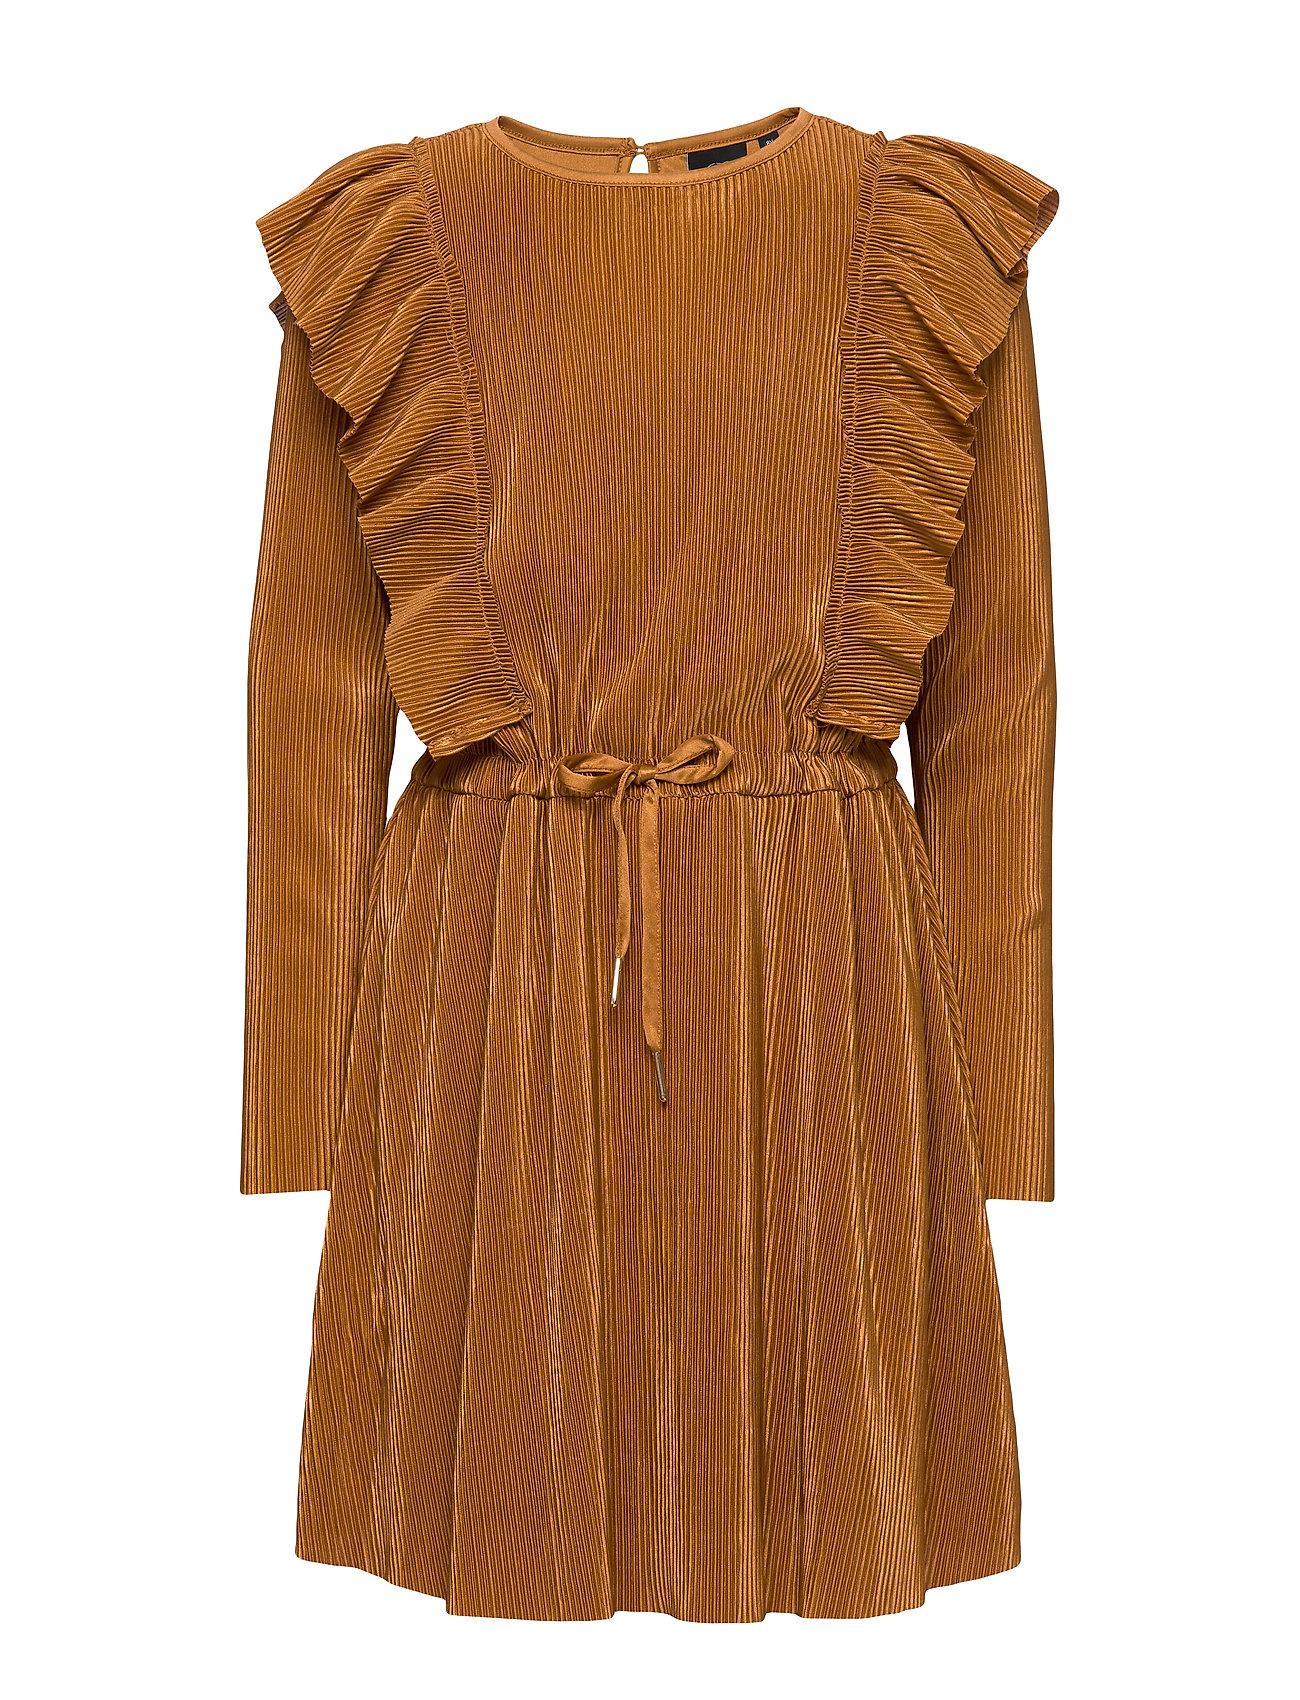 Petit by Sofie Schnoor Dress - GOLD